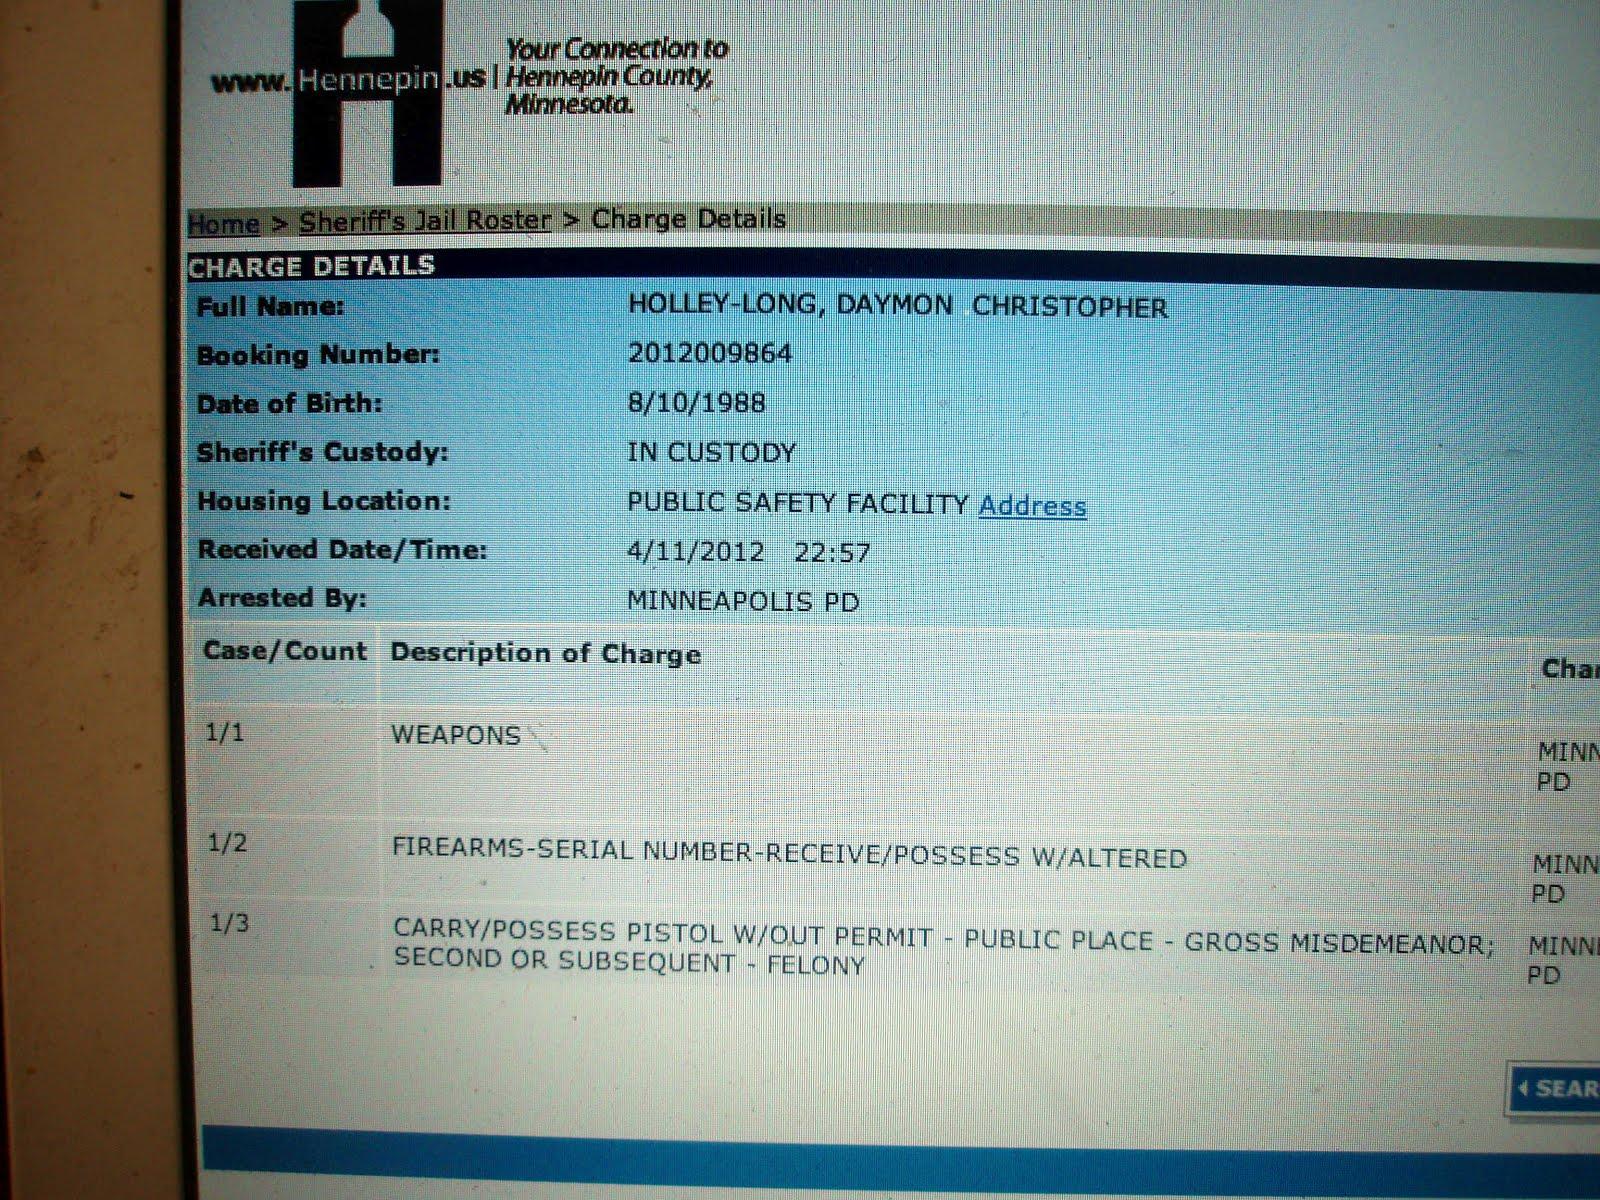 Hennepin County Sheriffs Jail Roster